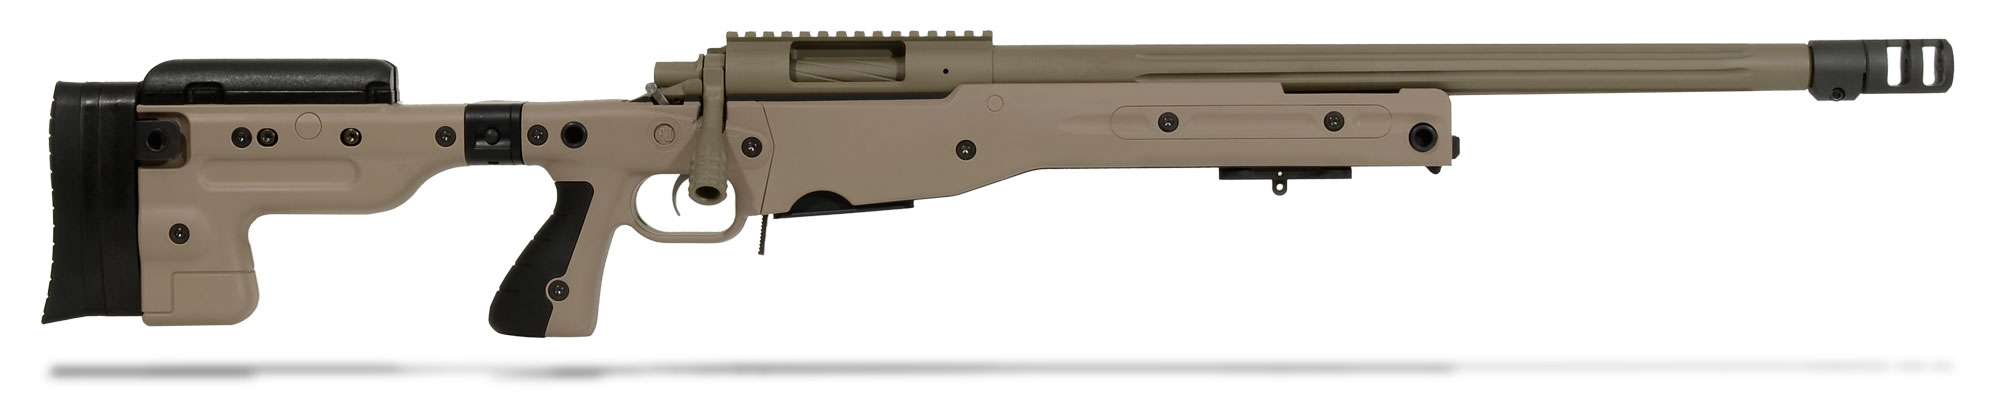 Surgeon Scalpel 308 Winchester FDE Rifle